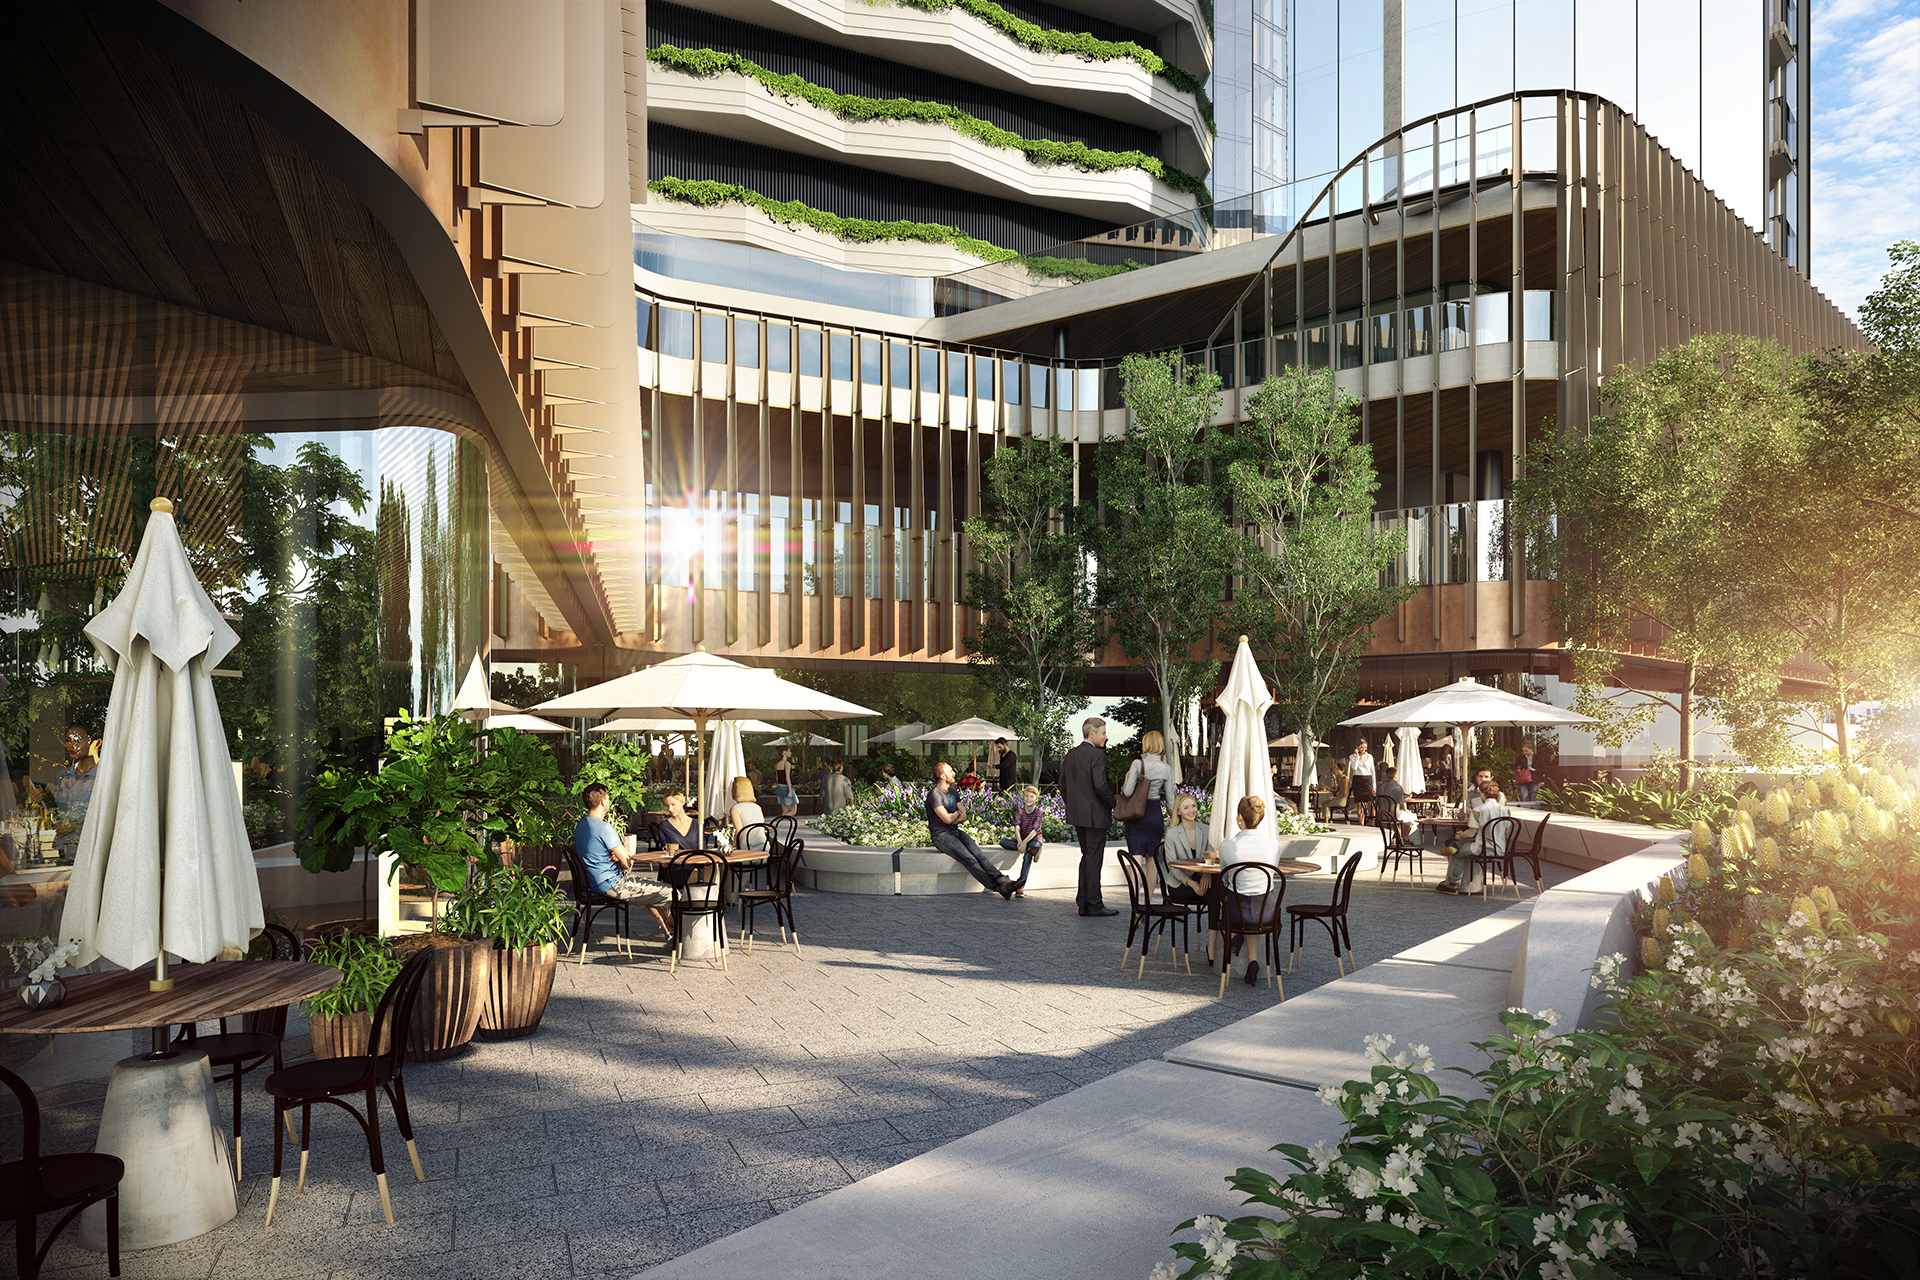 OSKH9386 Melbourne Square ER01 Retail Laneway